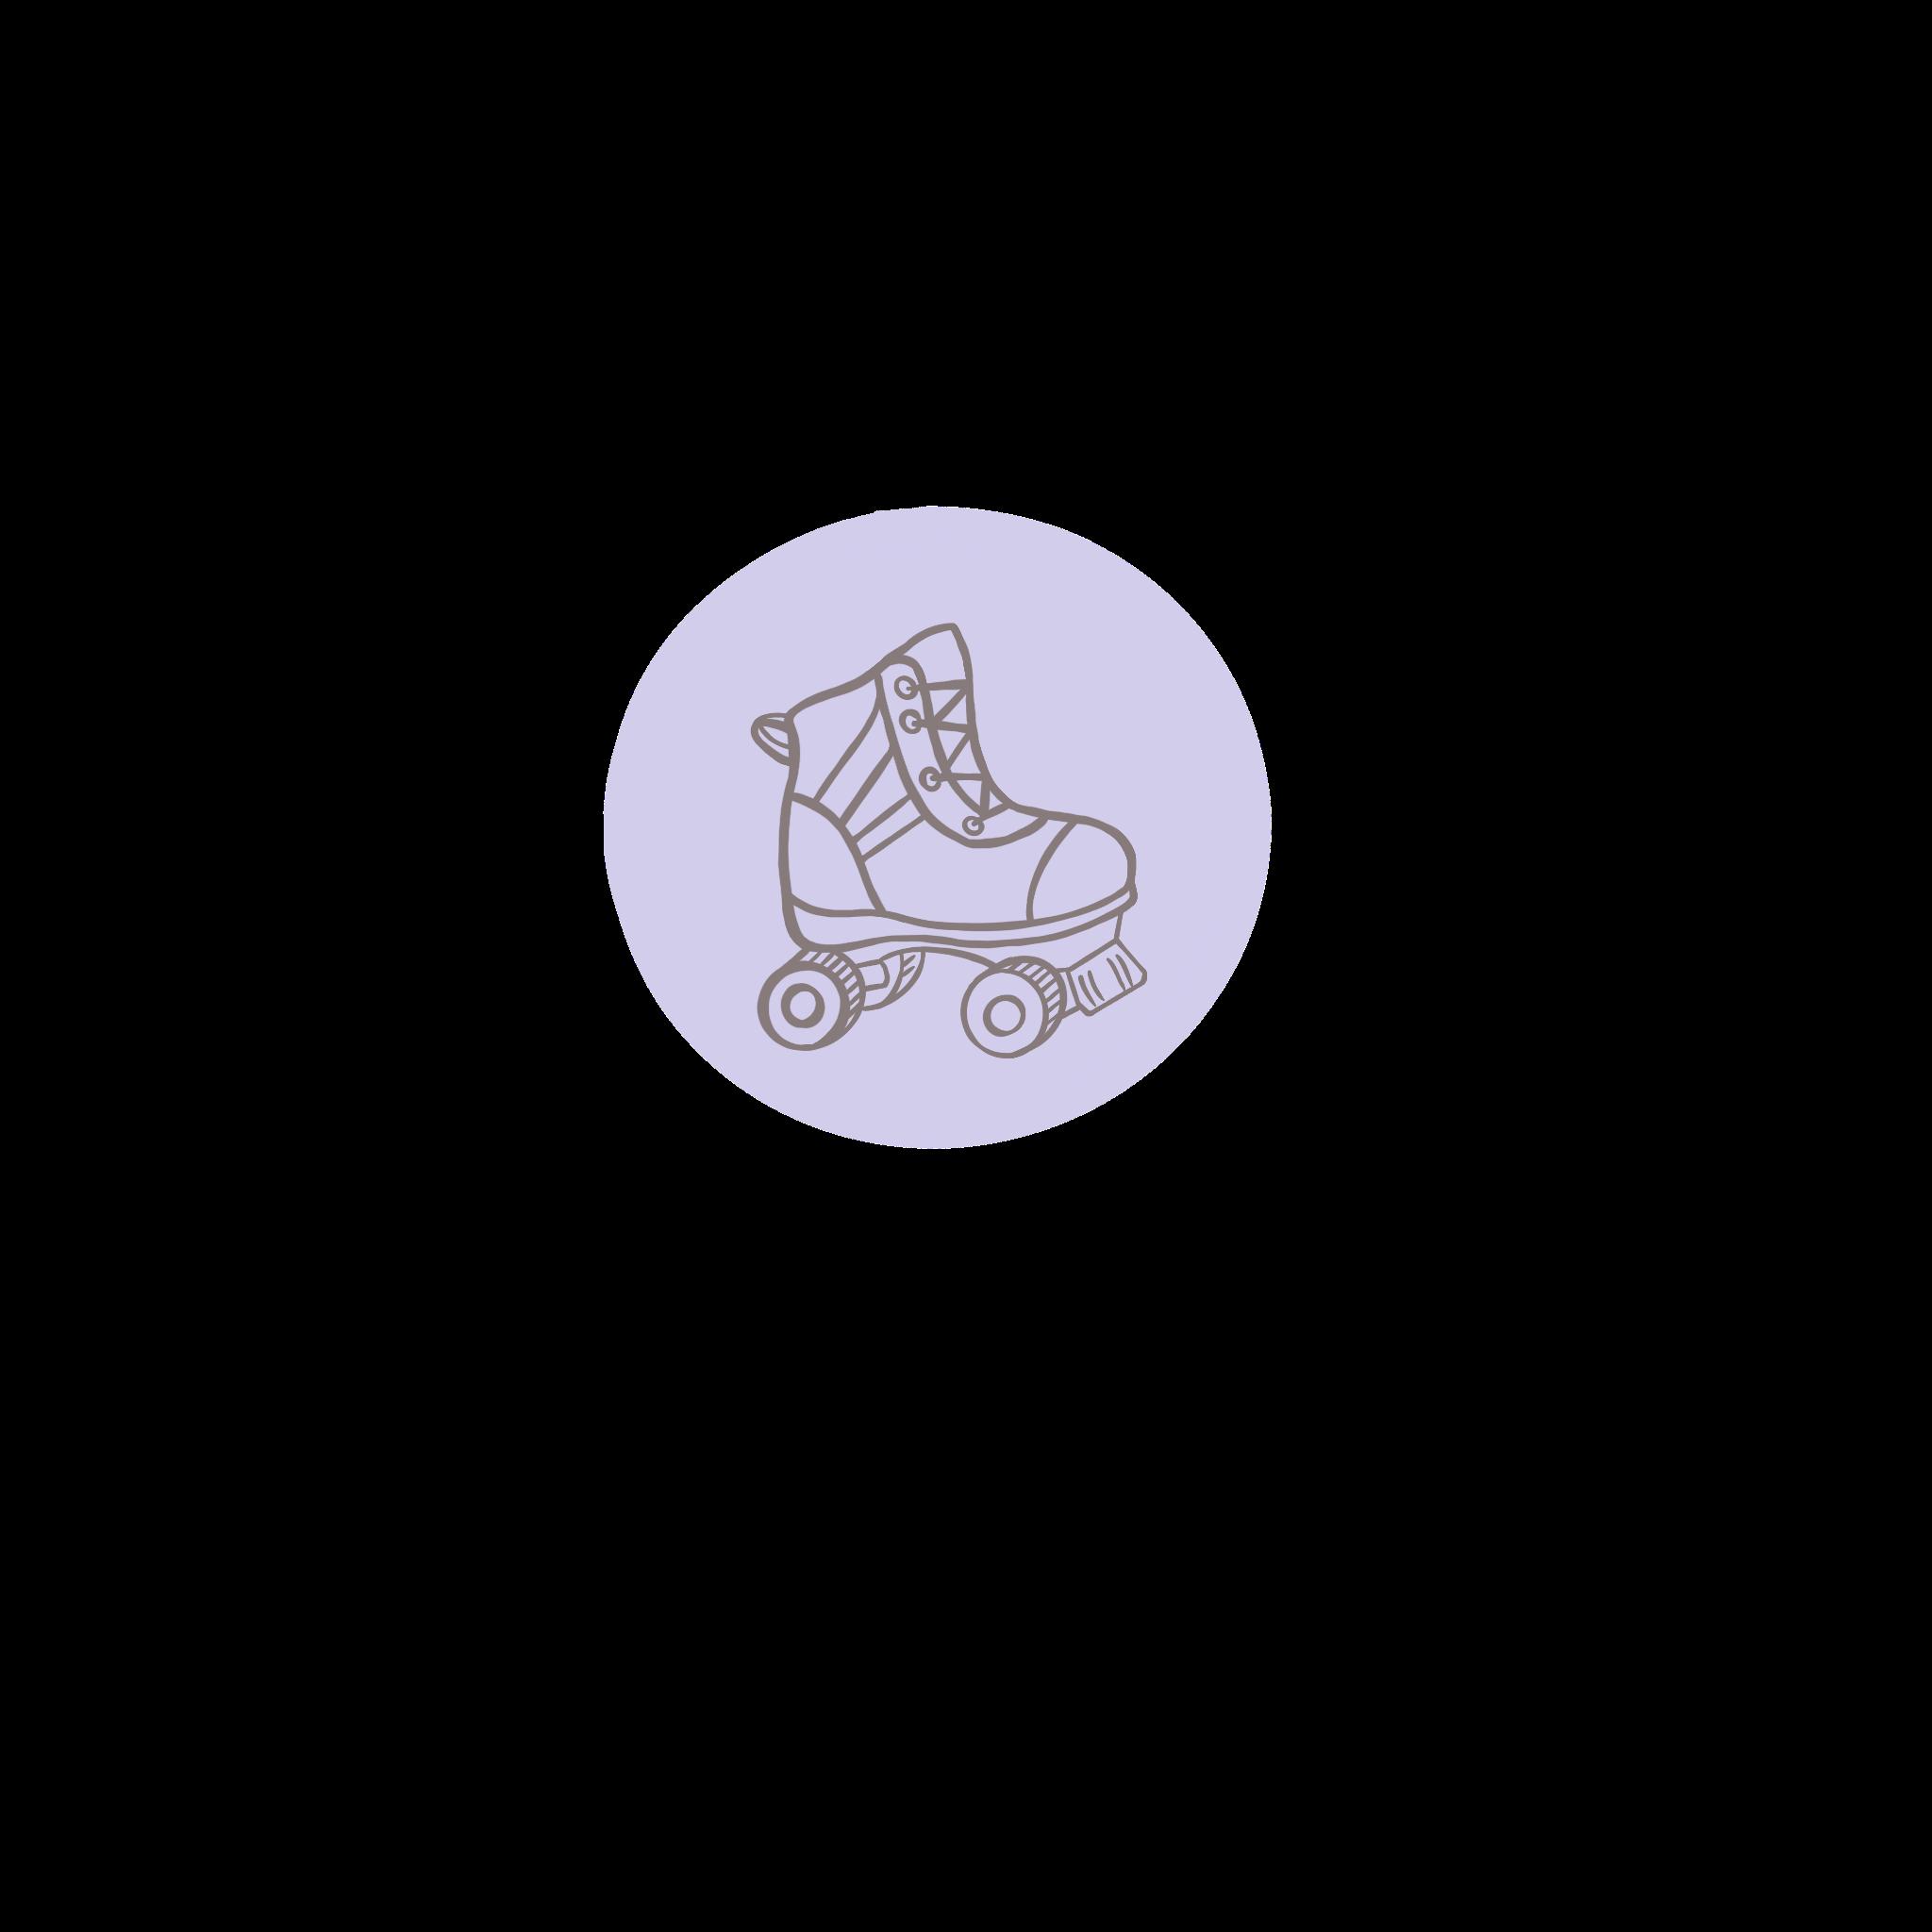 an illustration of a roller skate